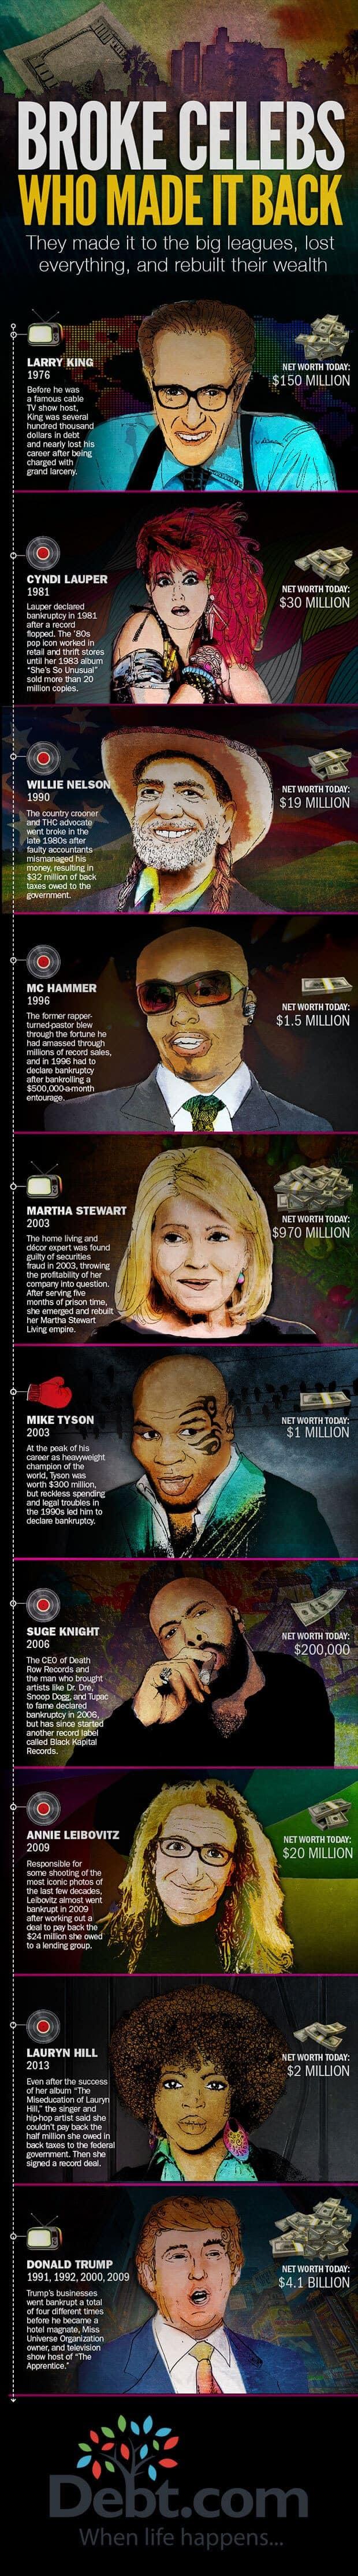 Celebrity debt infographic